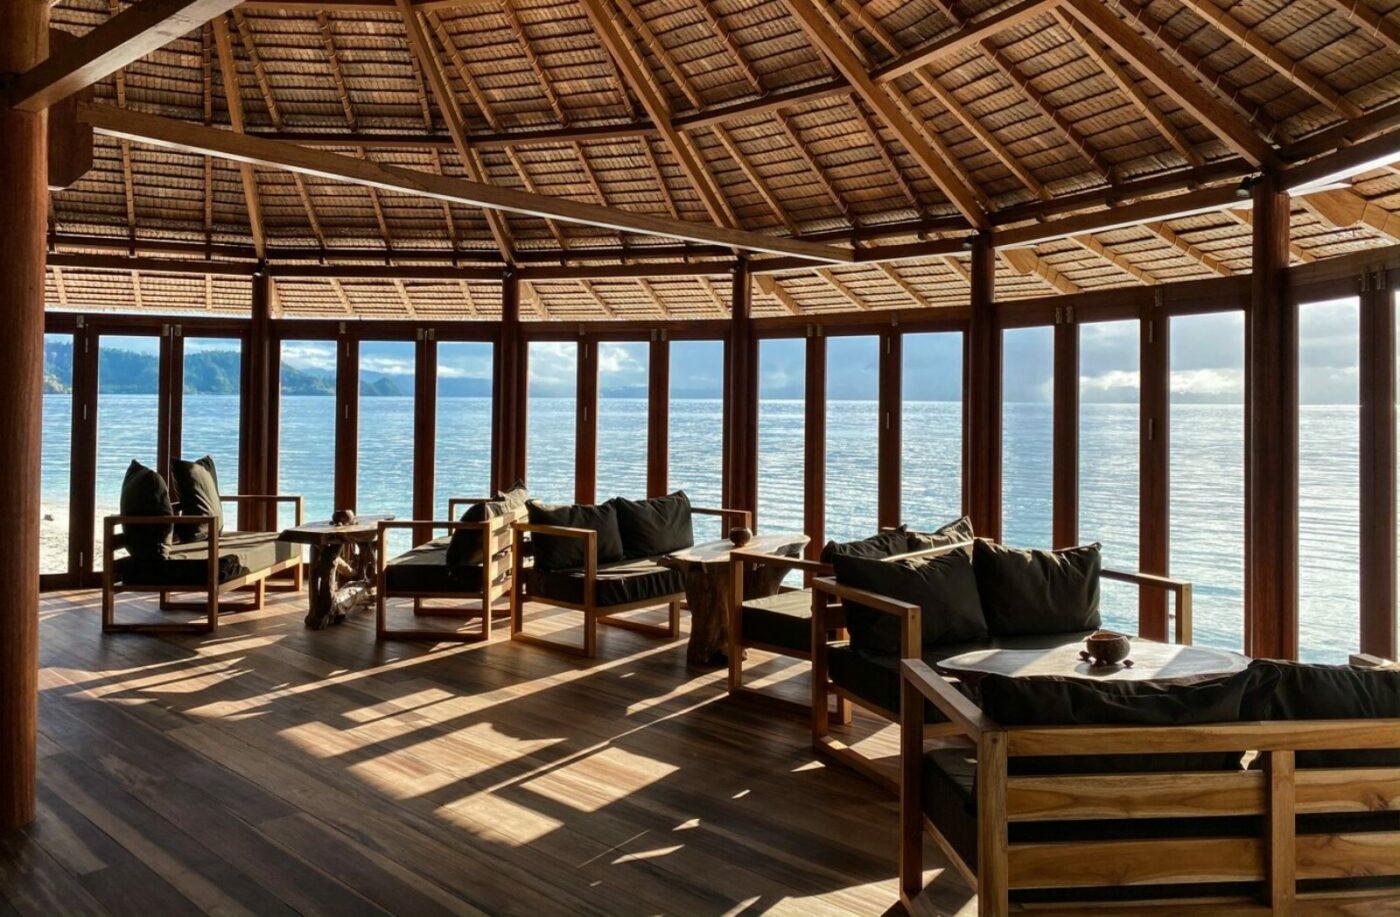 Kusu Island Resort - Restaurant with sea view